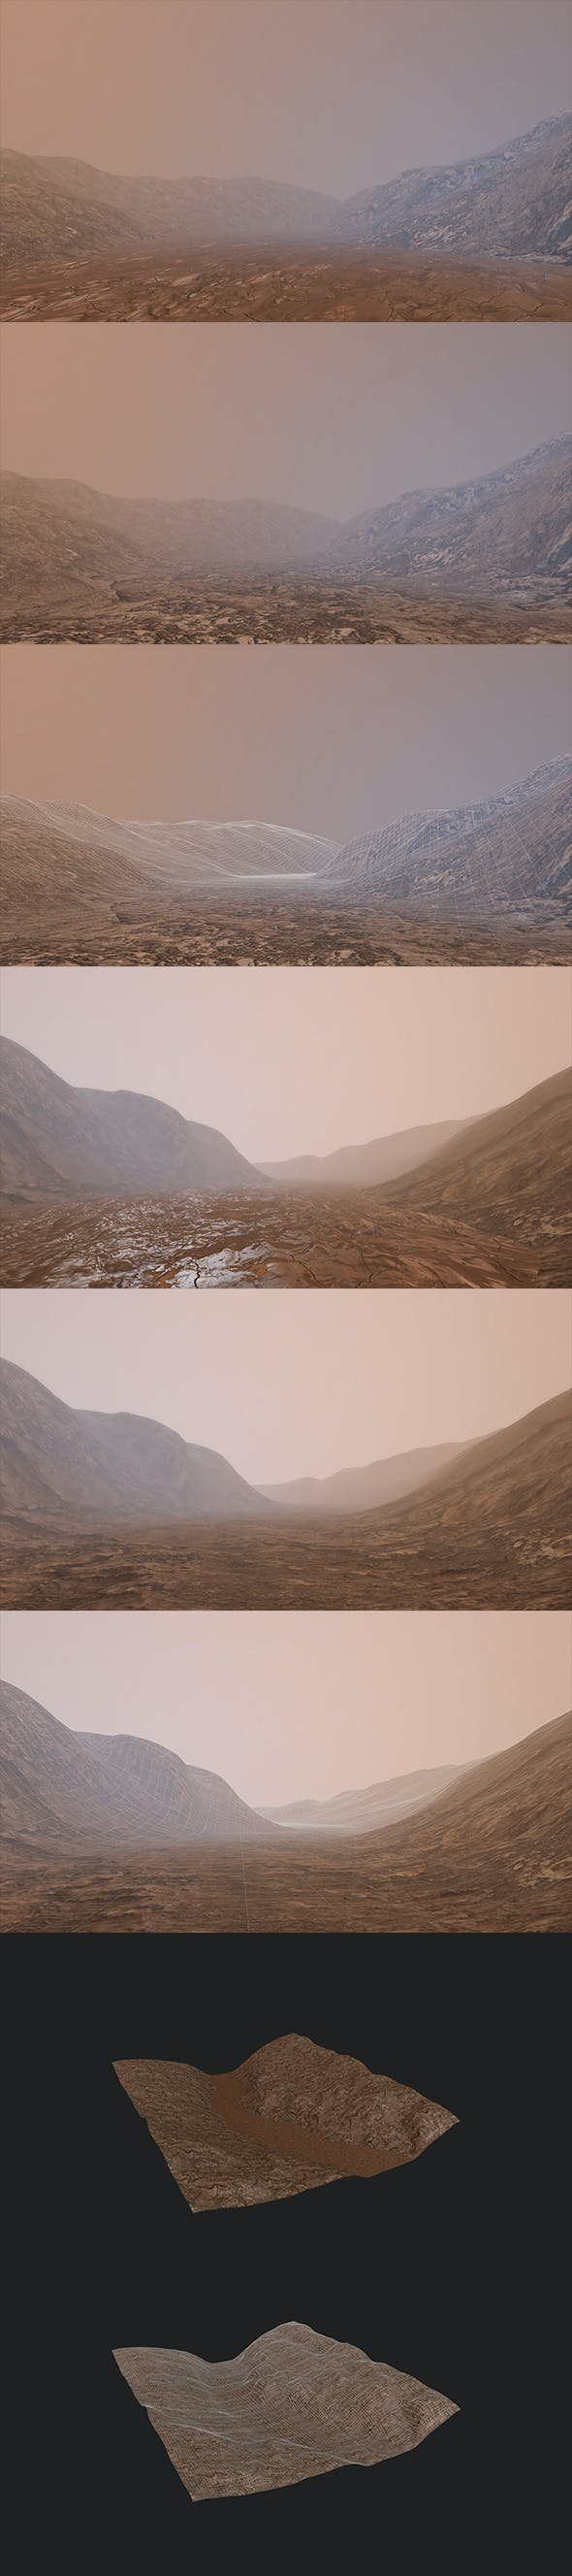 Landscape Mountain - 3DOcean Item for Sale